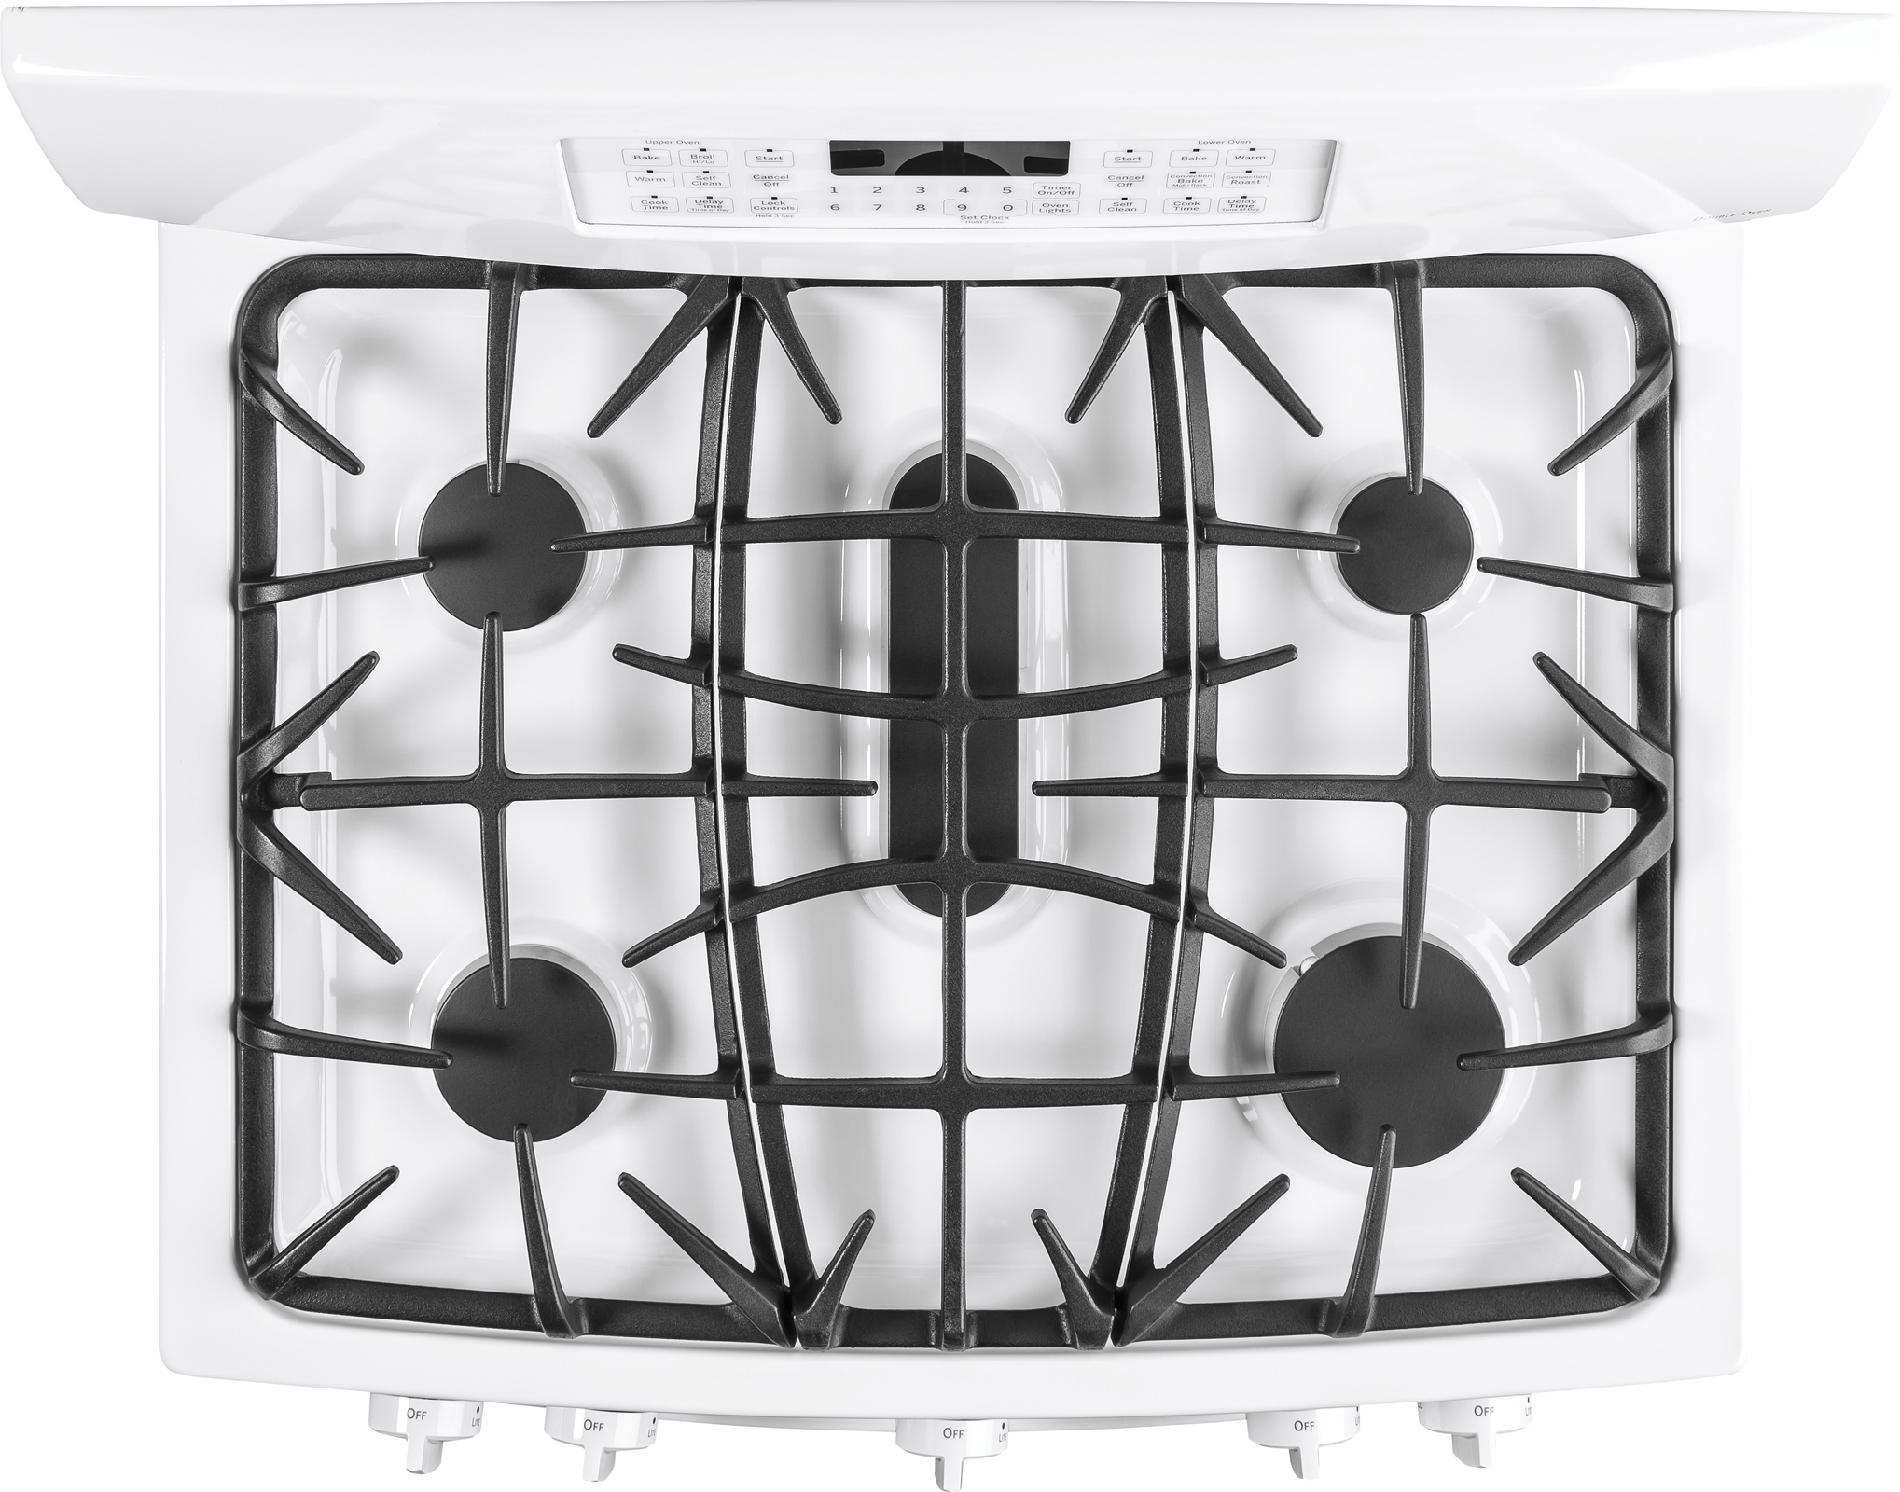 GE Appliances 6.8 cu. ft. Gas Range w/ Double Oven, Convection - White